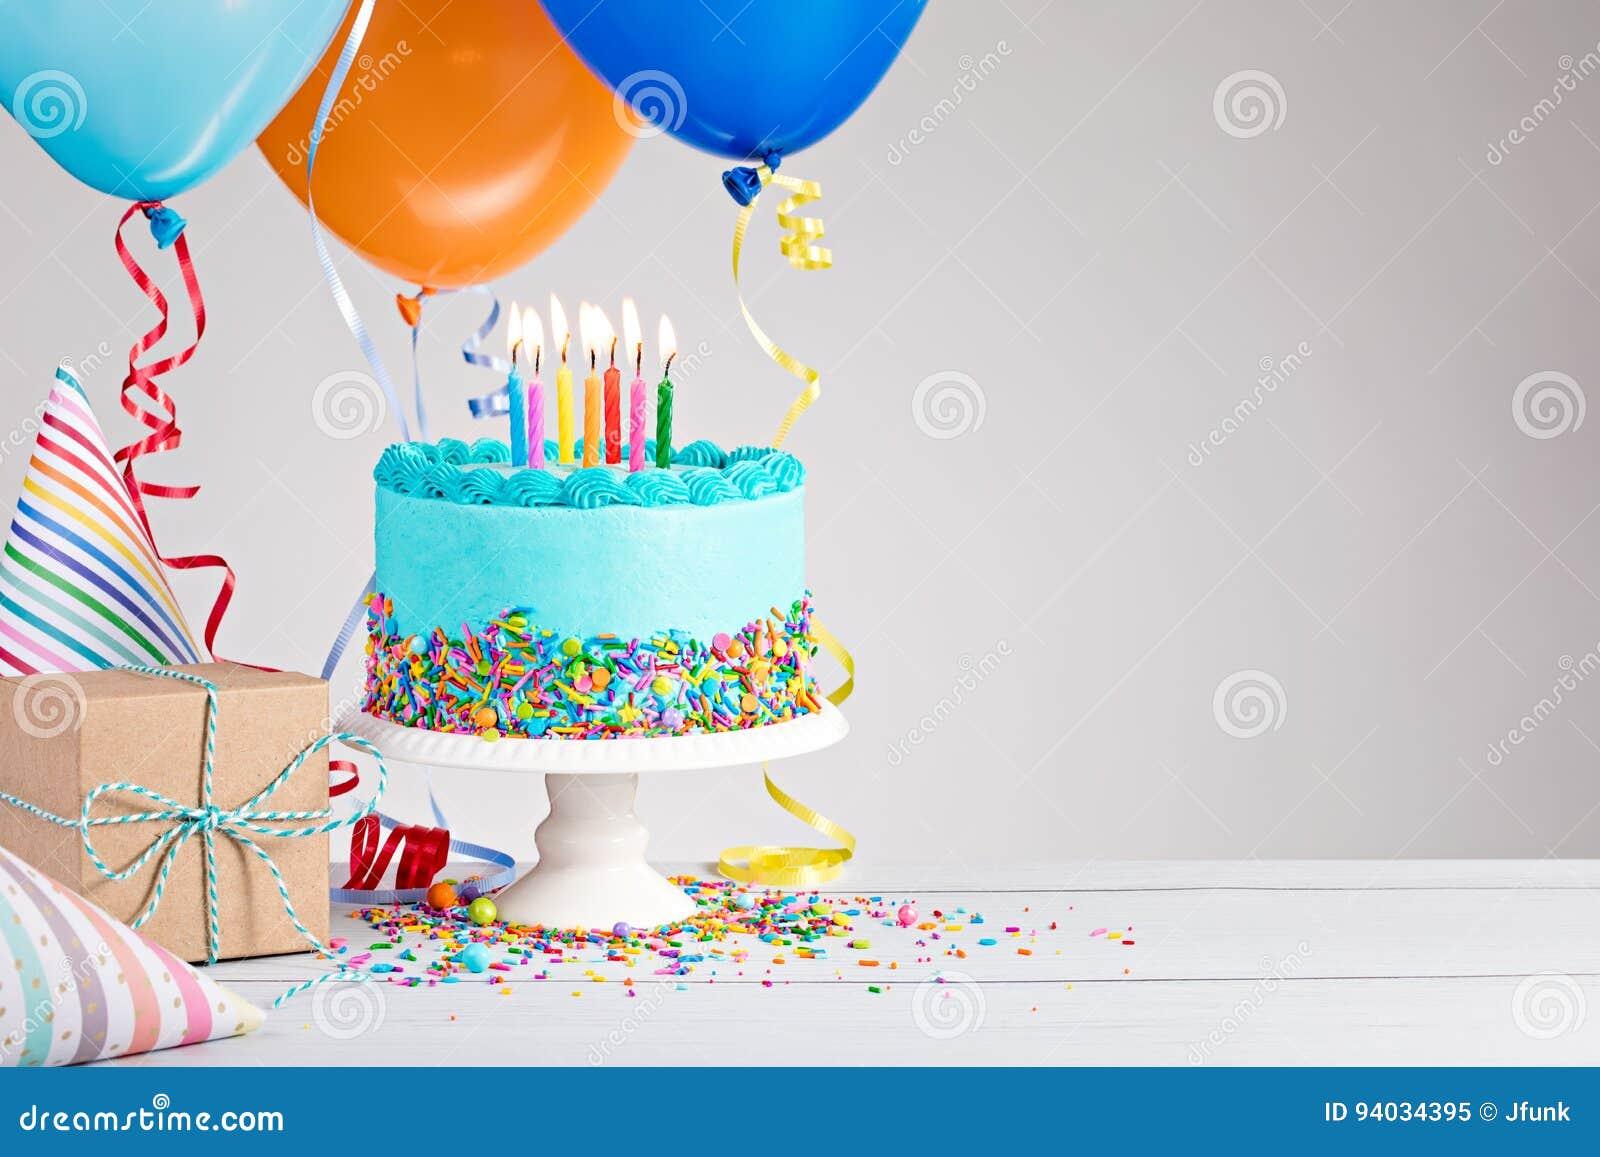 Download Blue Birthday Cake stock image. Image of cream, dessert - 94034395